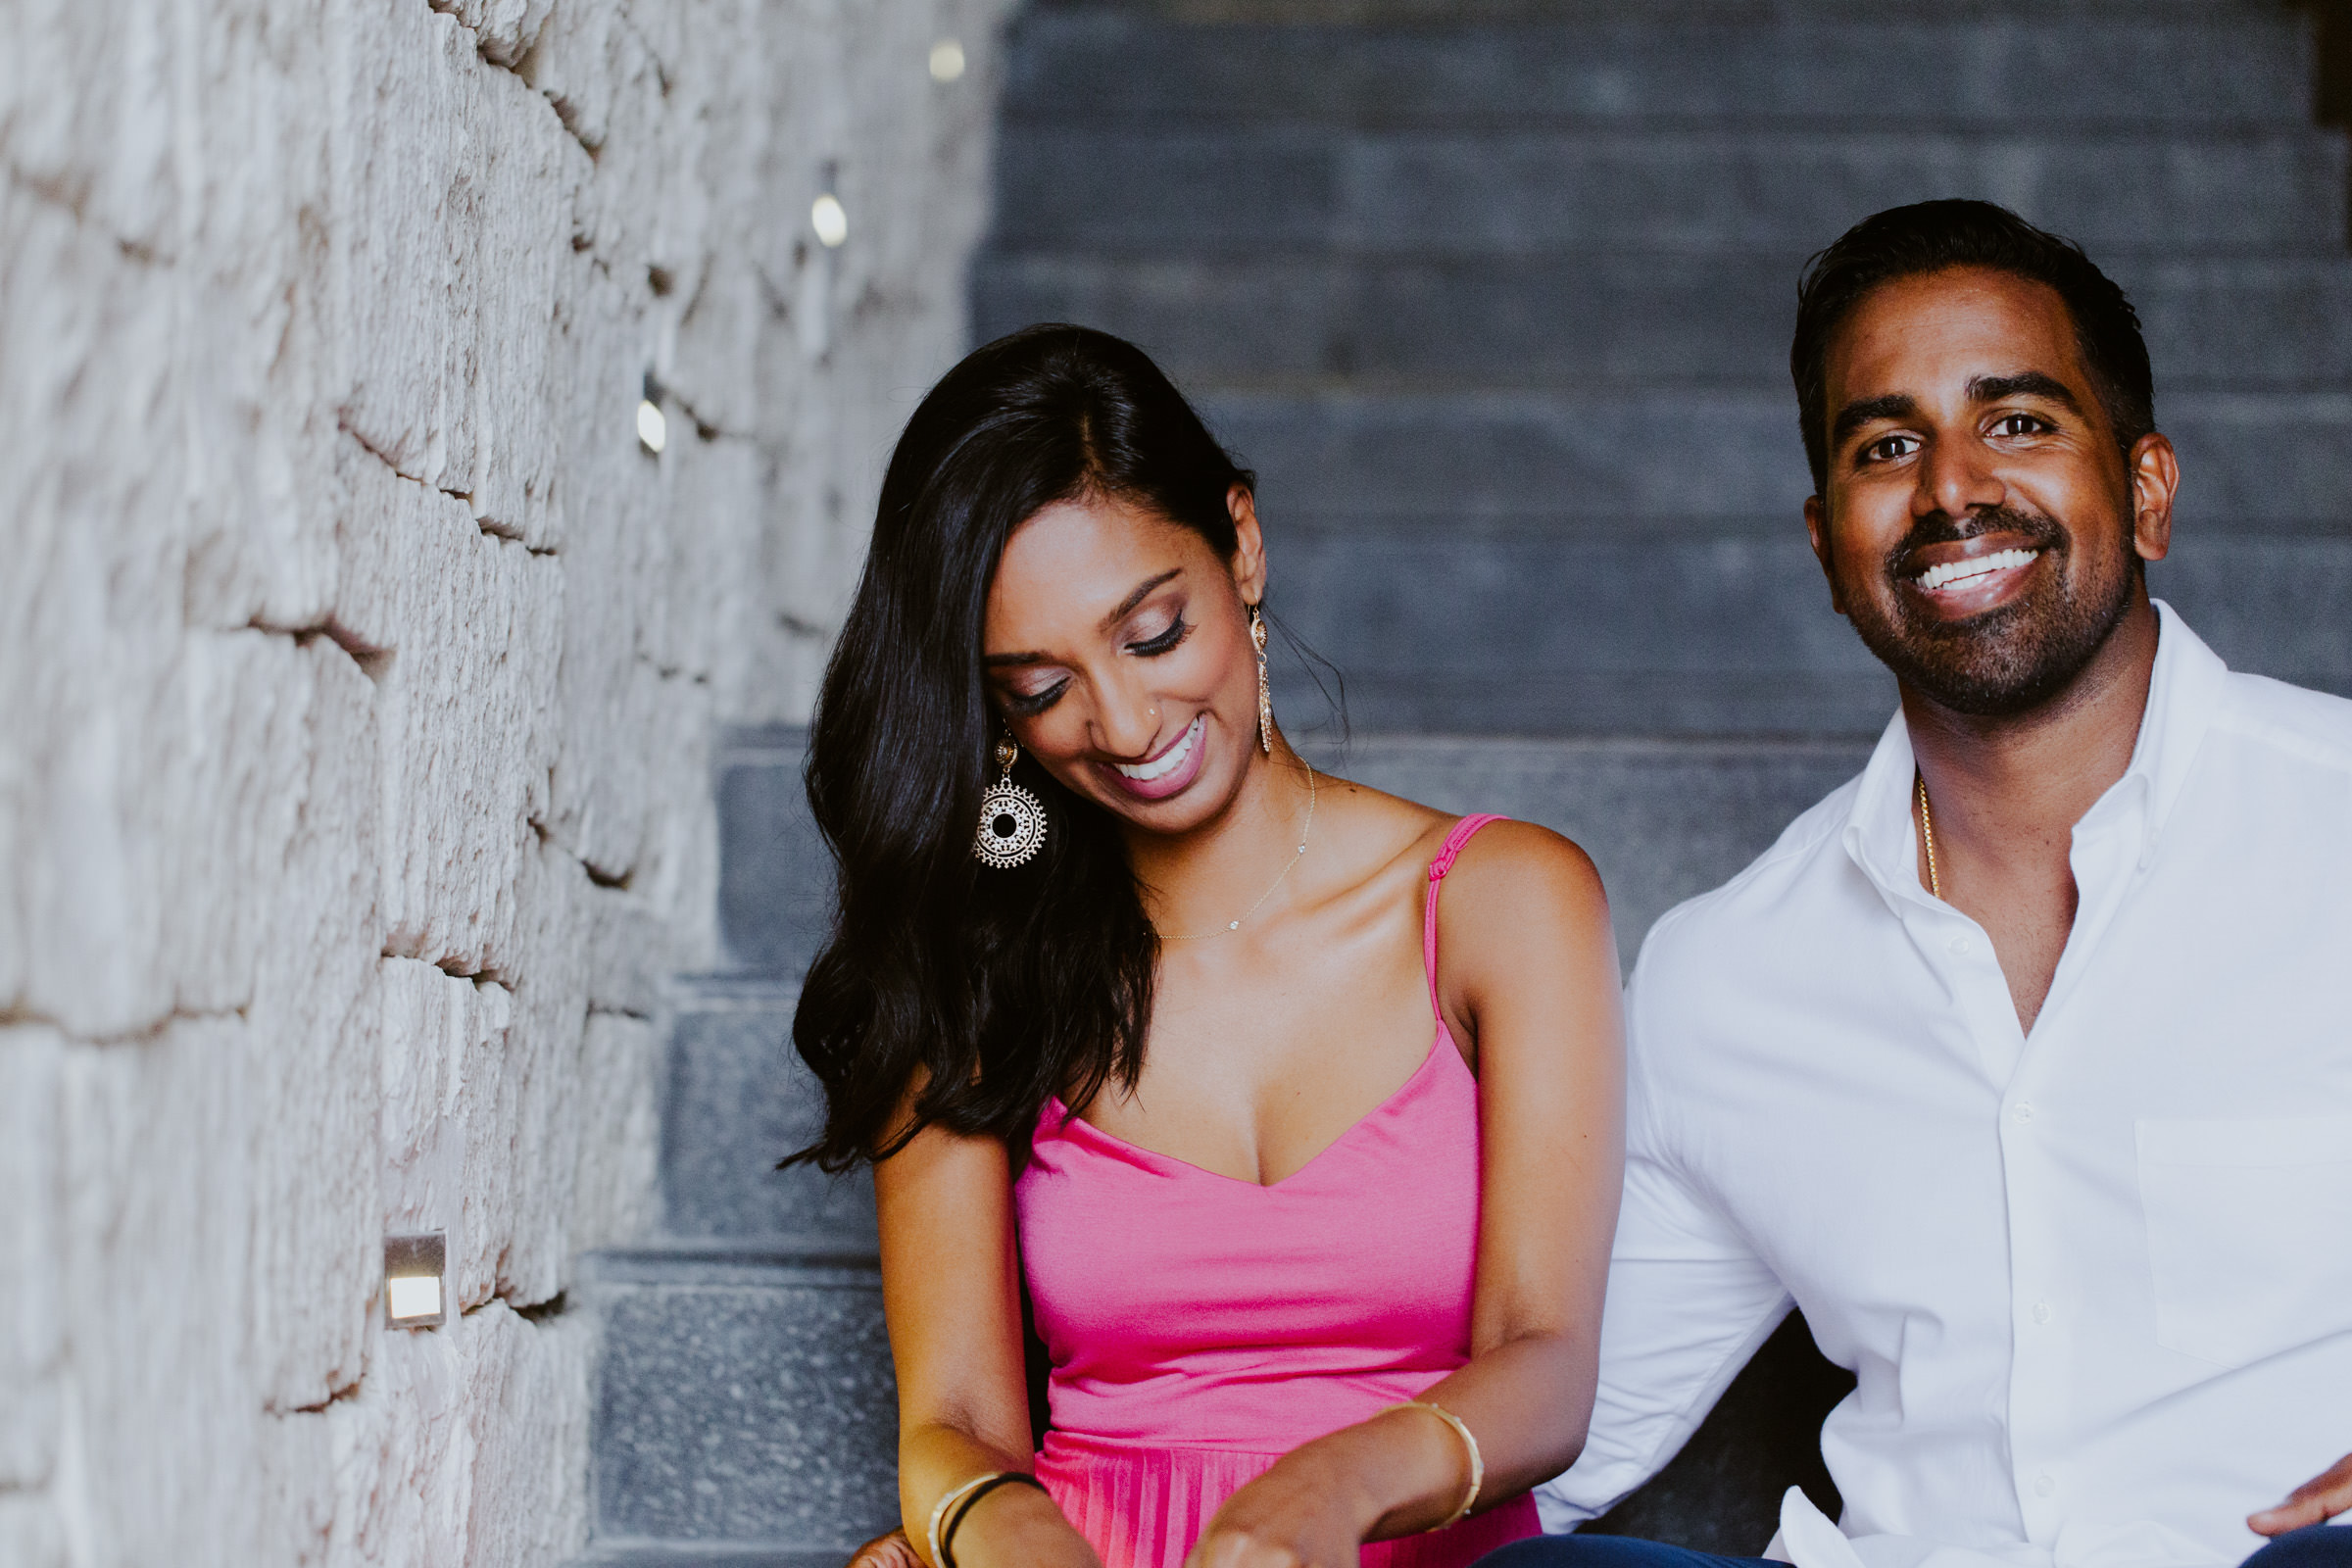 Engagement-Session-Nizuc-Resort-Spa-Indian-Wedding-Cancun-Mexico-Pierce--4.jpg